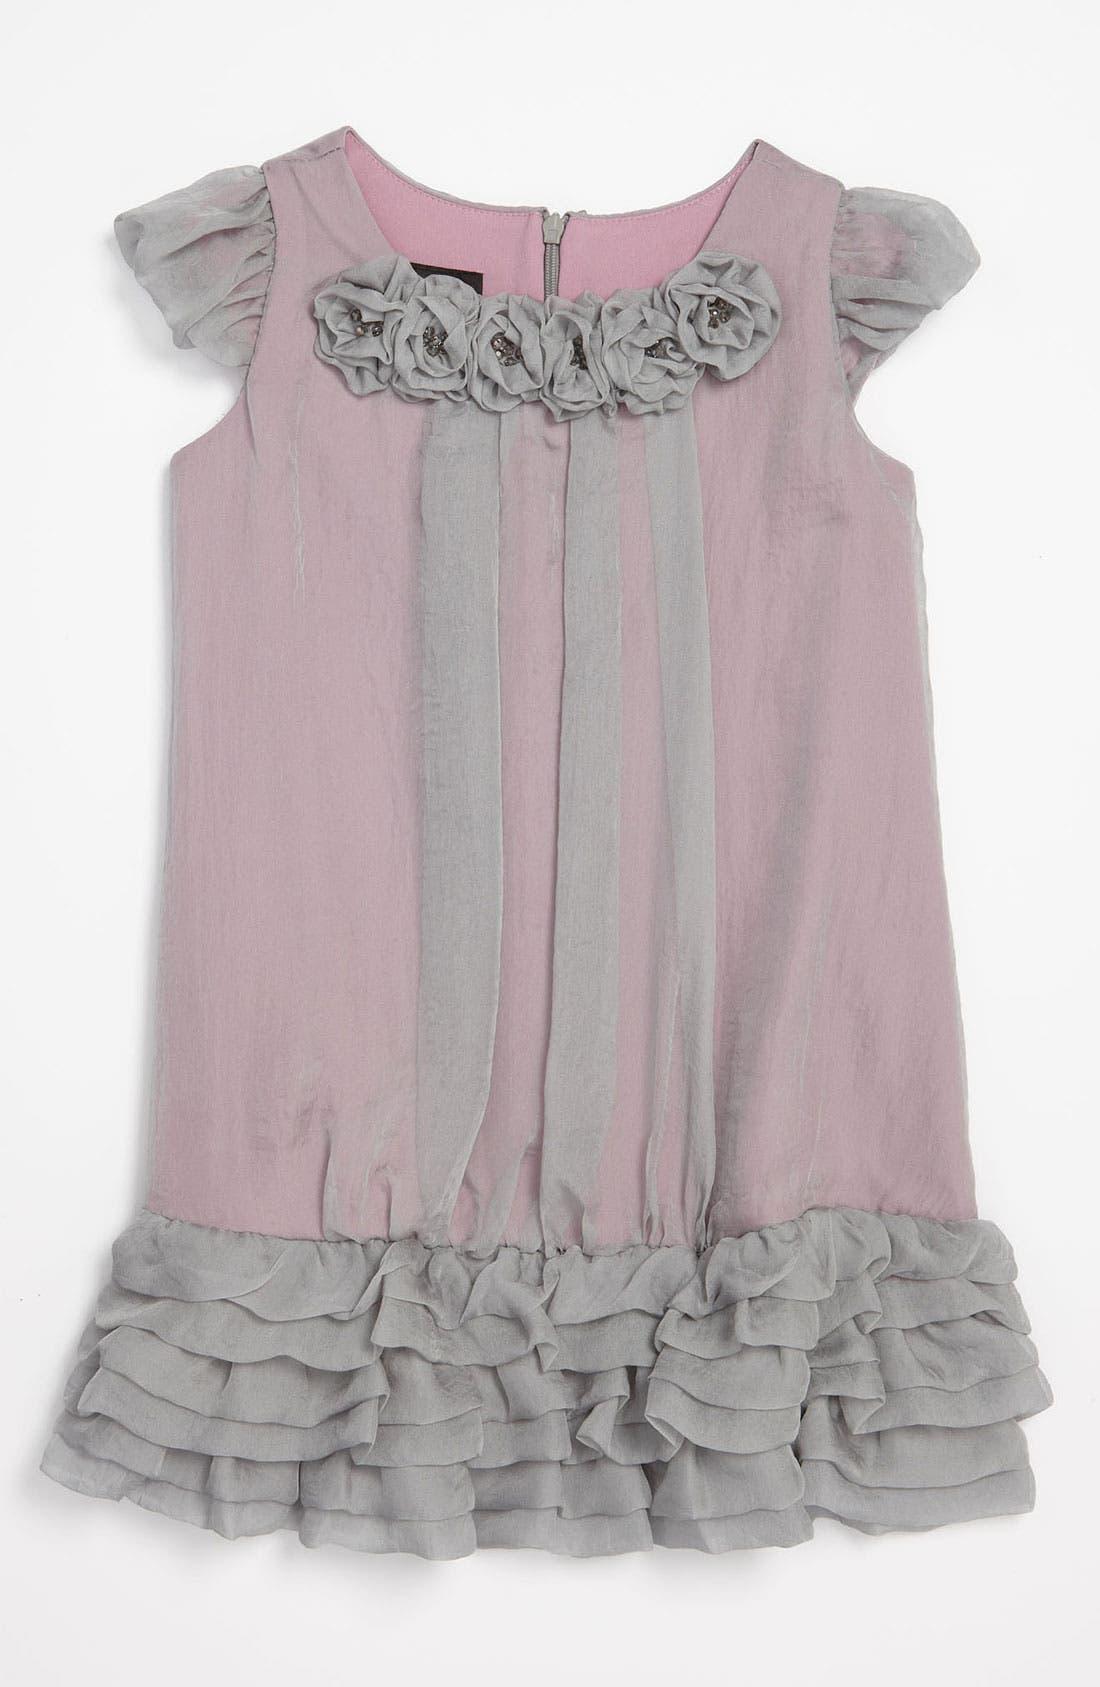 Alternate Image 1 Selected - Isobella & Chloe 'Miranda' Dress (Toddler)